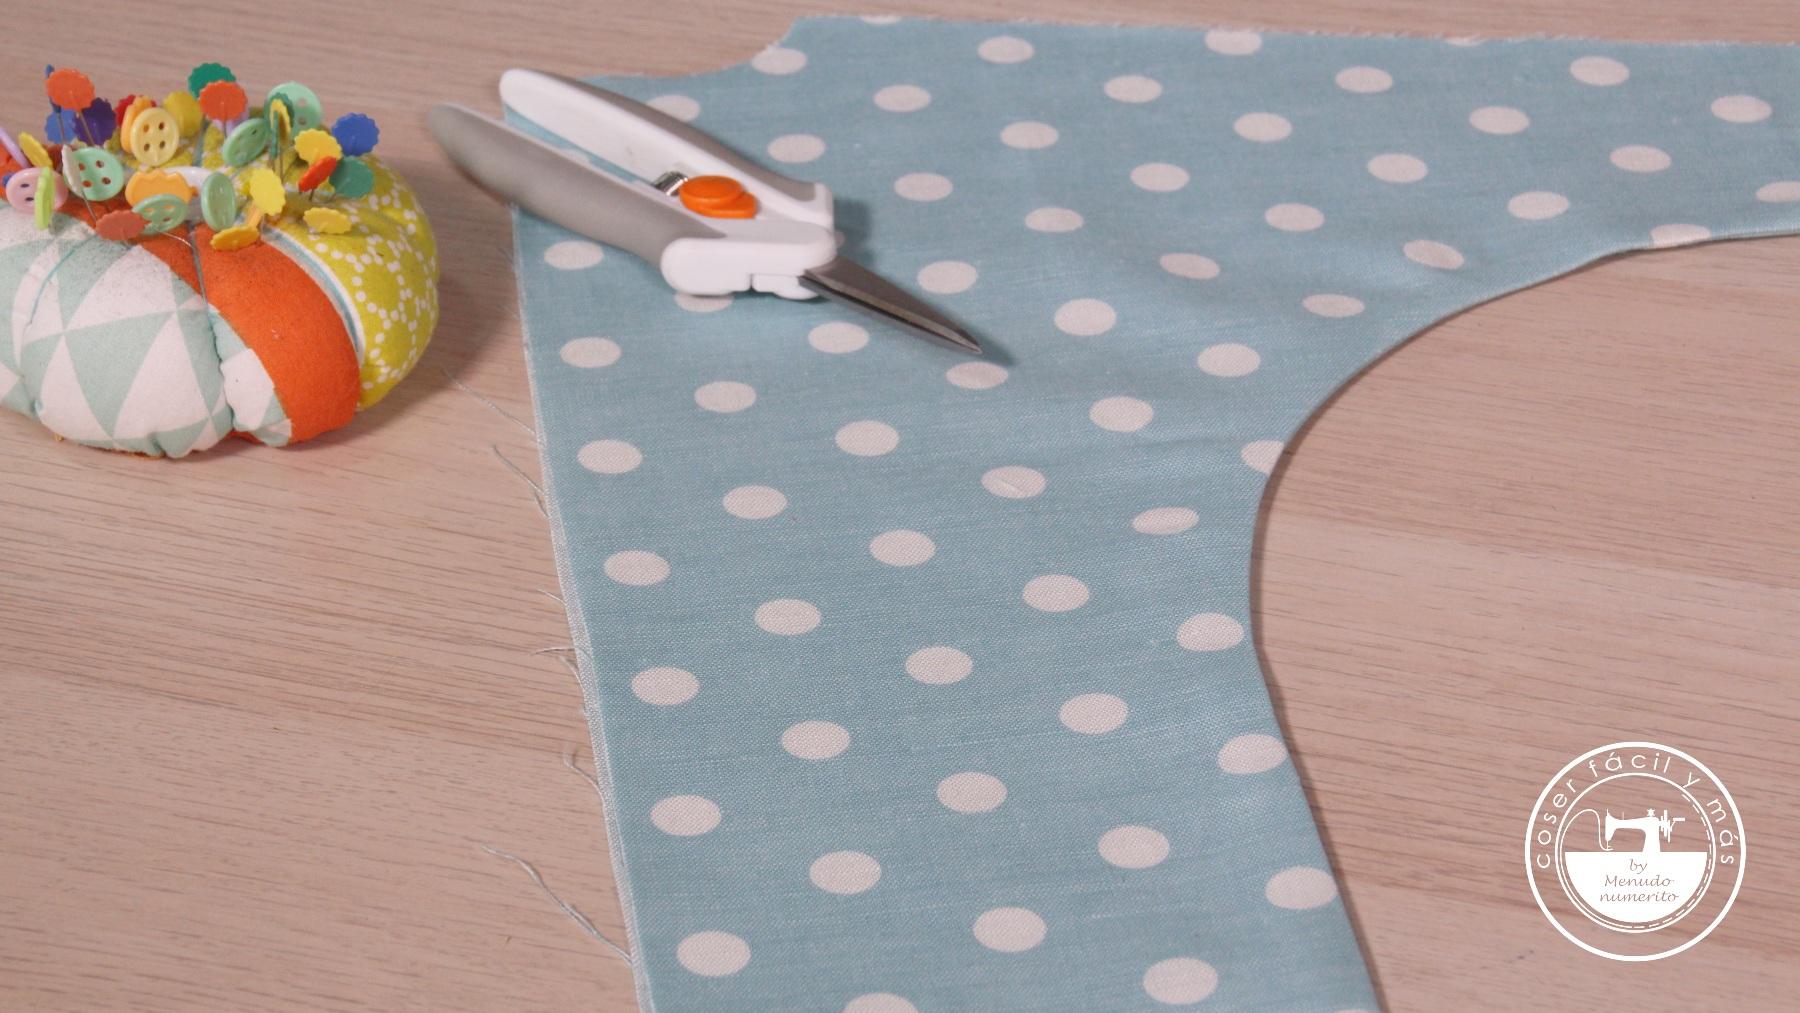 costura francesa menudo numerito blogs de costura tutorial